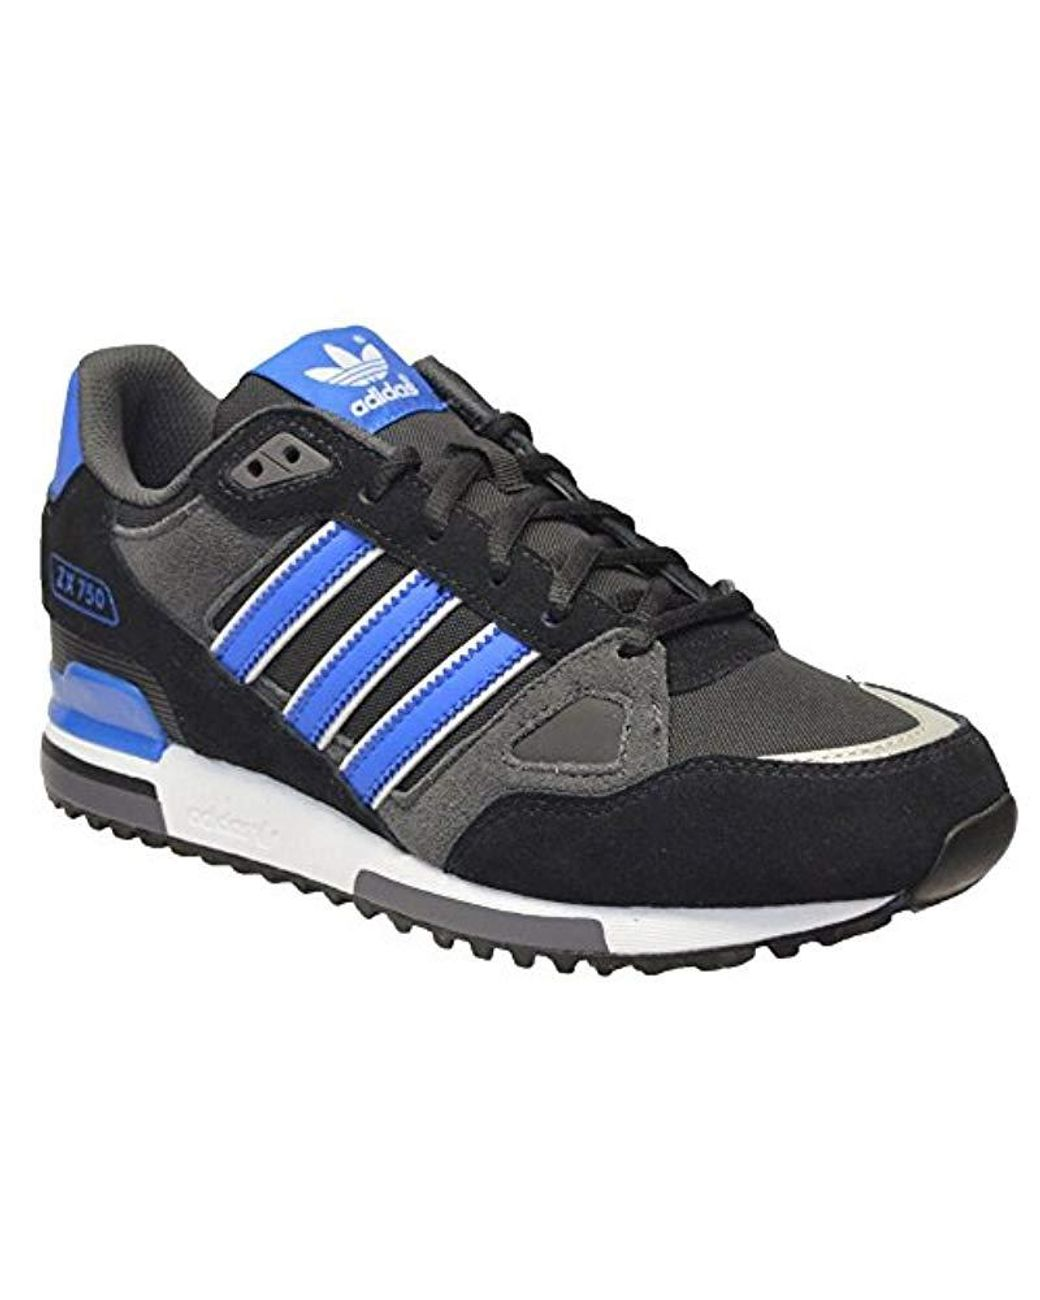 Adidas ORIGINALS ZX 750 Mens Trainers